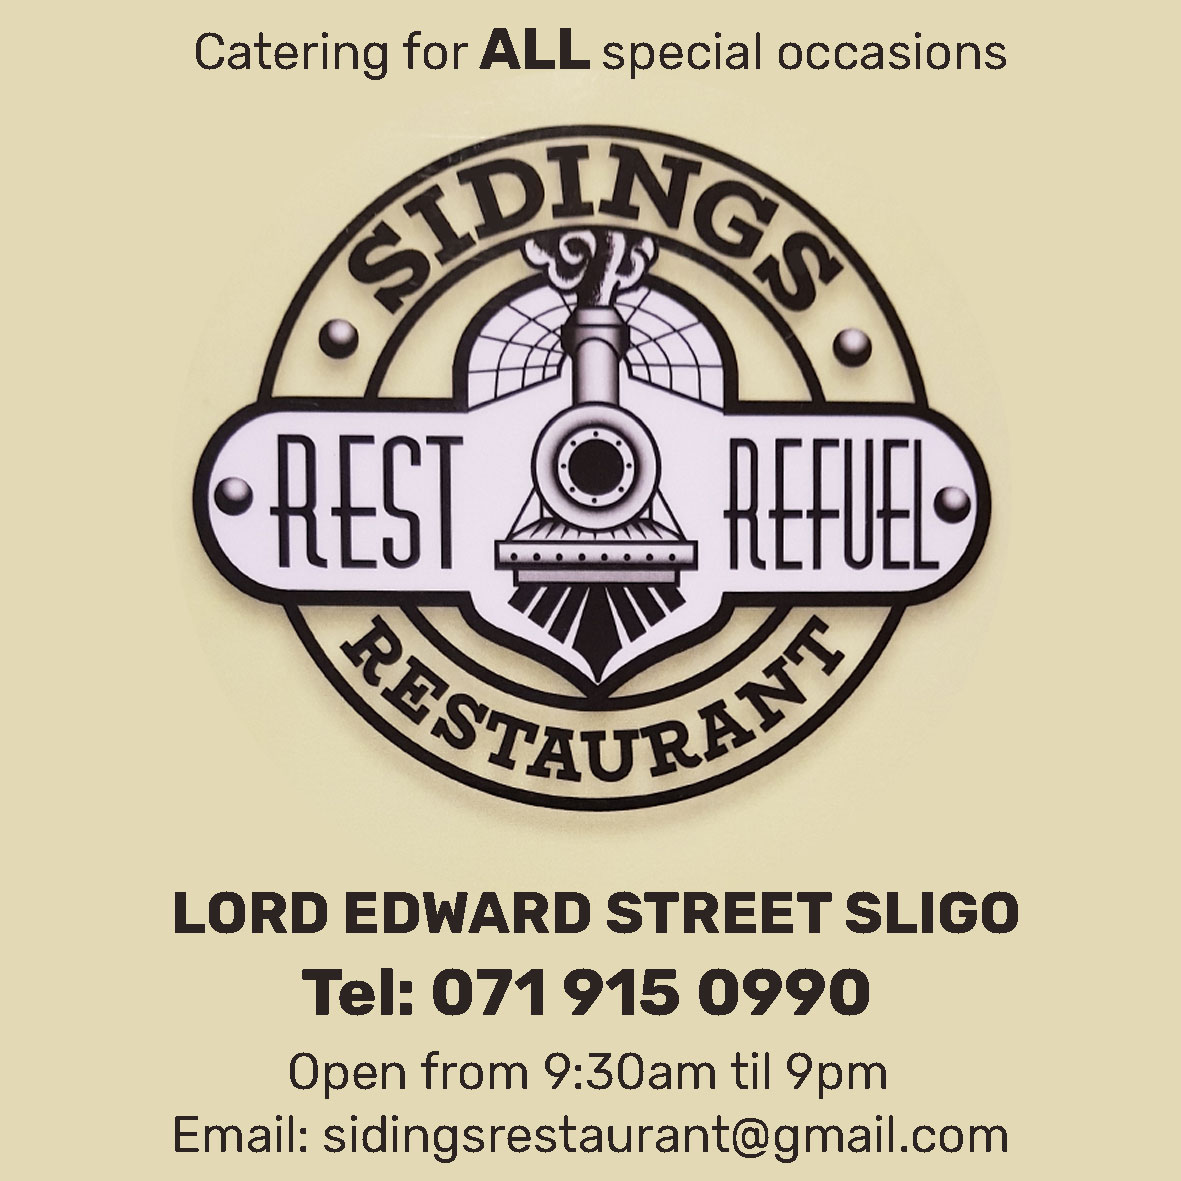 Sidings Restaurant